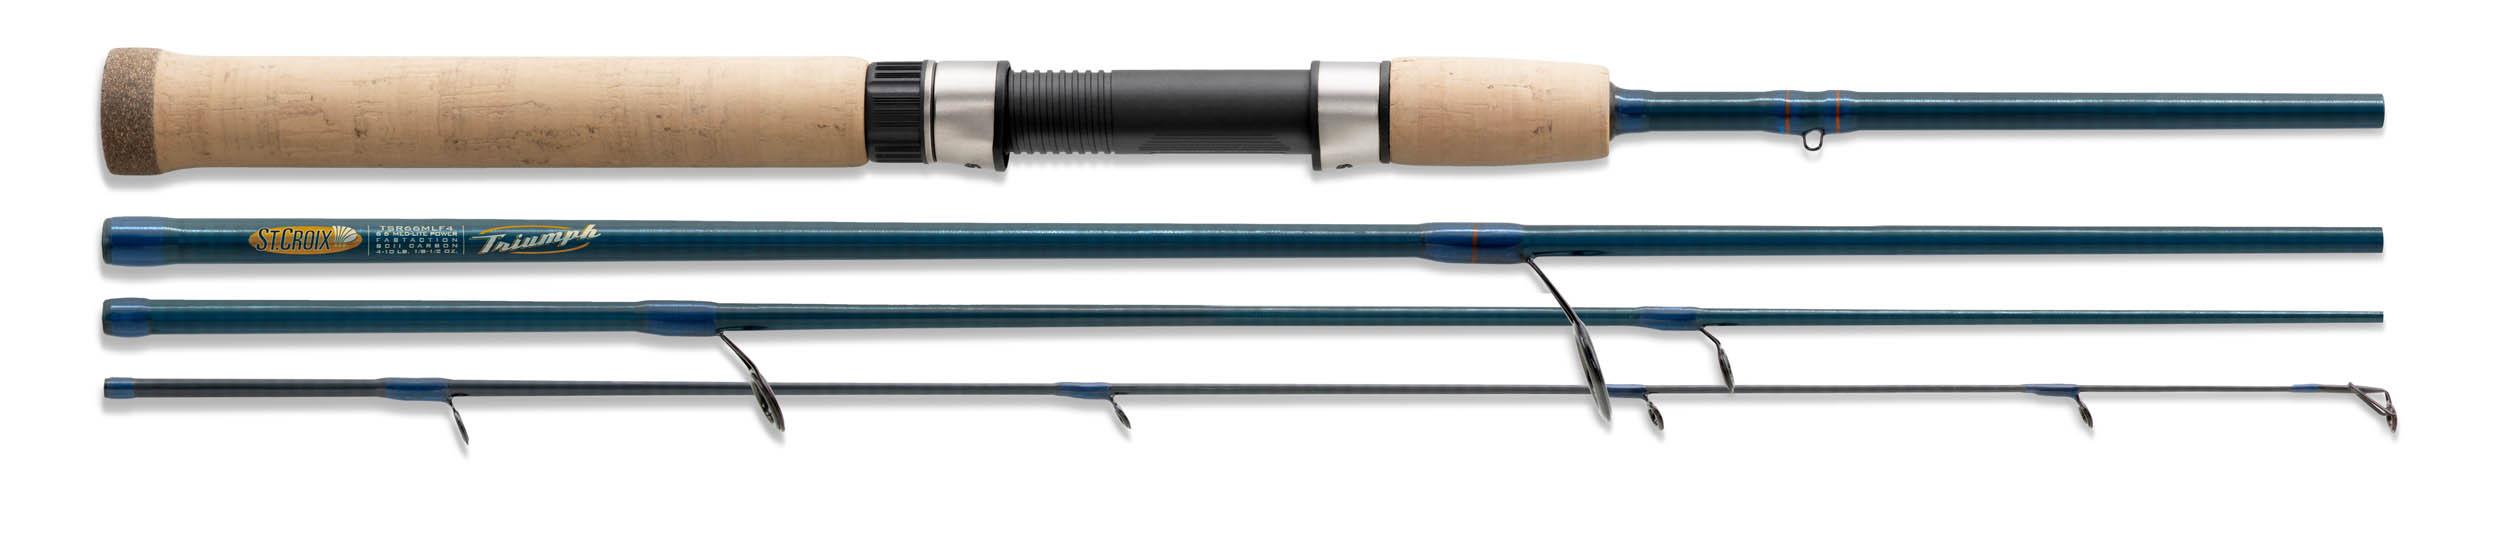 Fishing rod, green white background 2